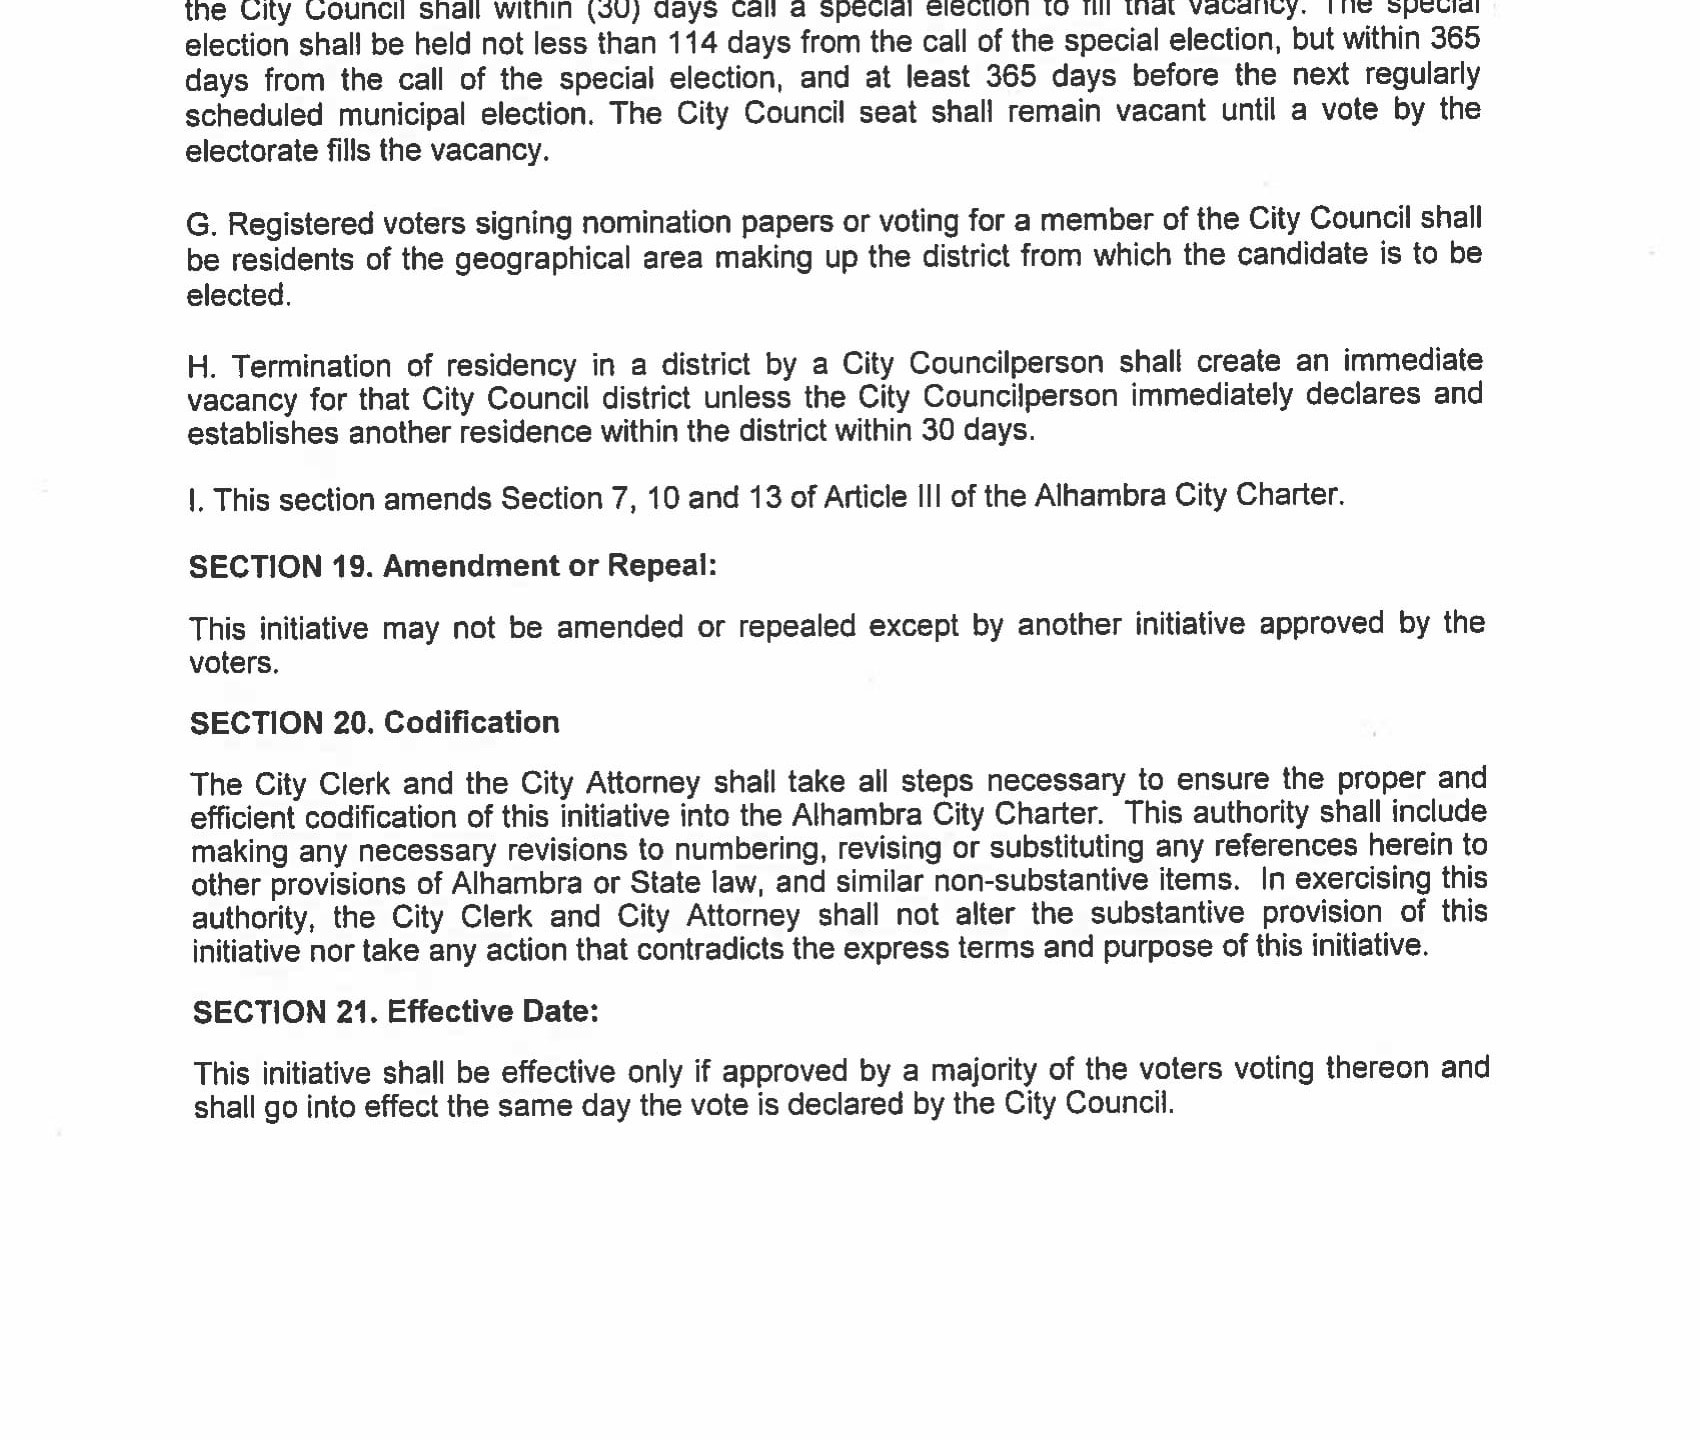 Initiative paperwork stamped by city clerk-13